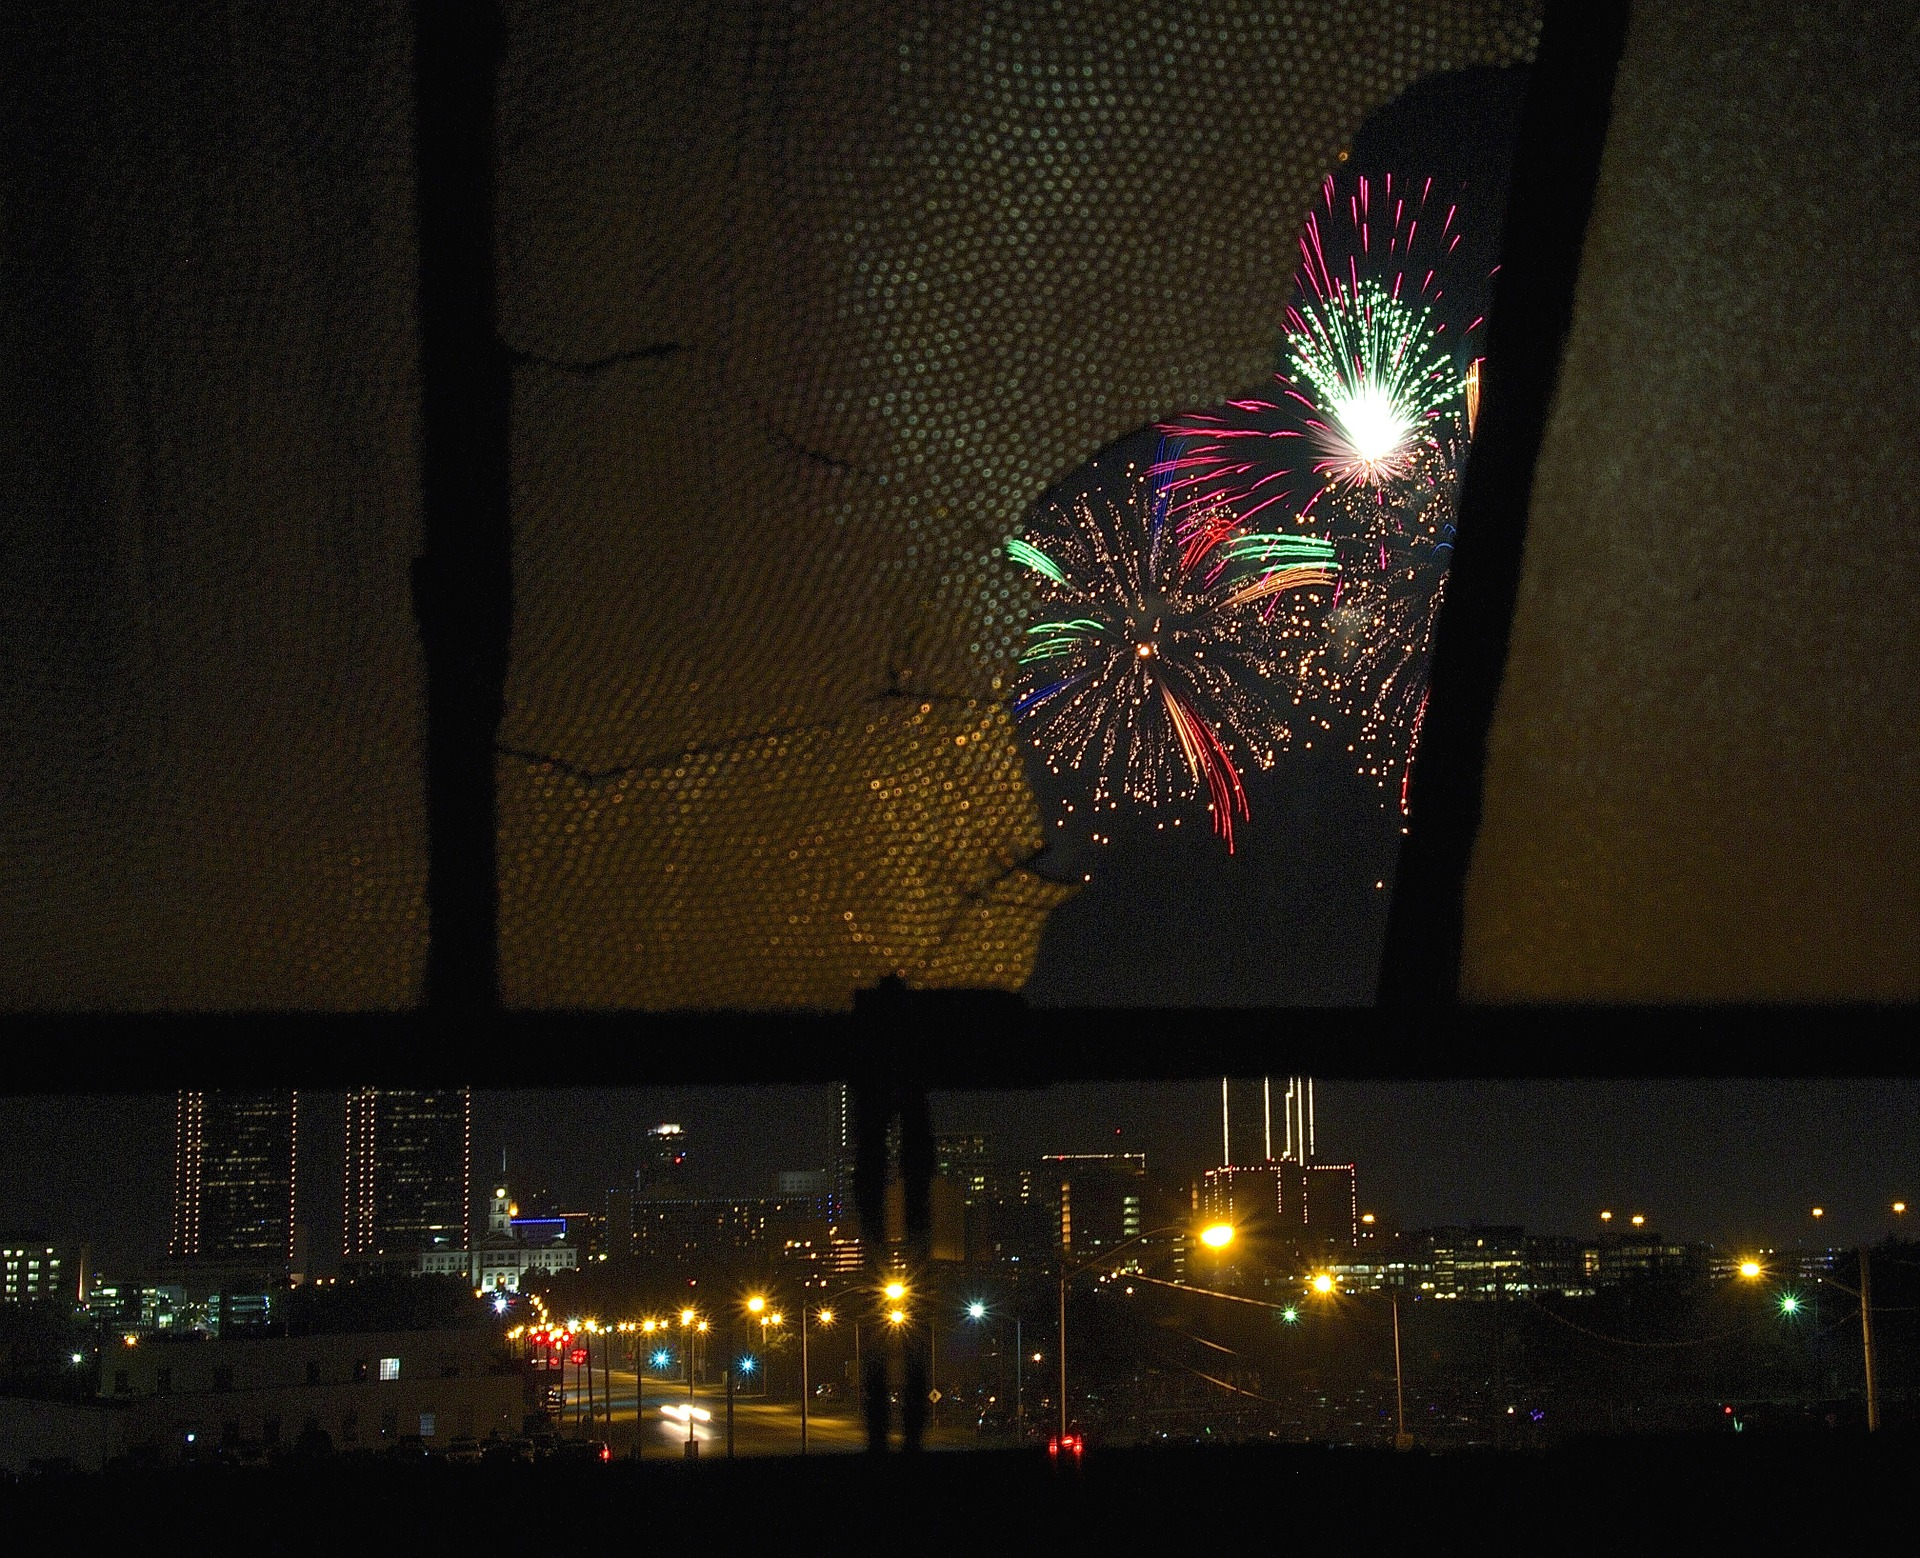 fireworks-845776_1920.jpg